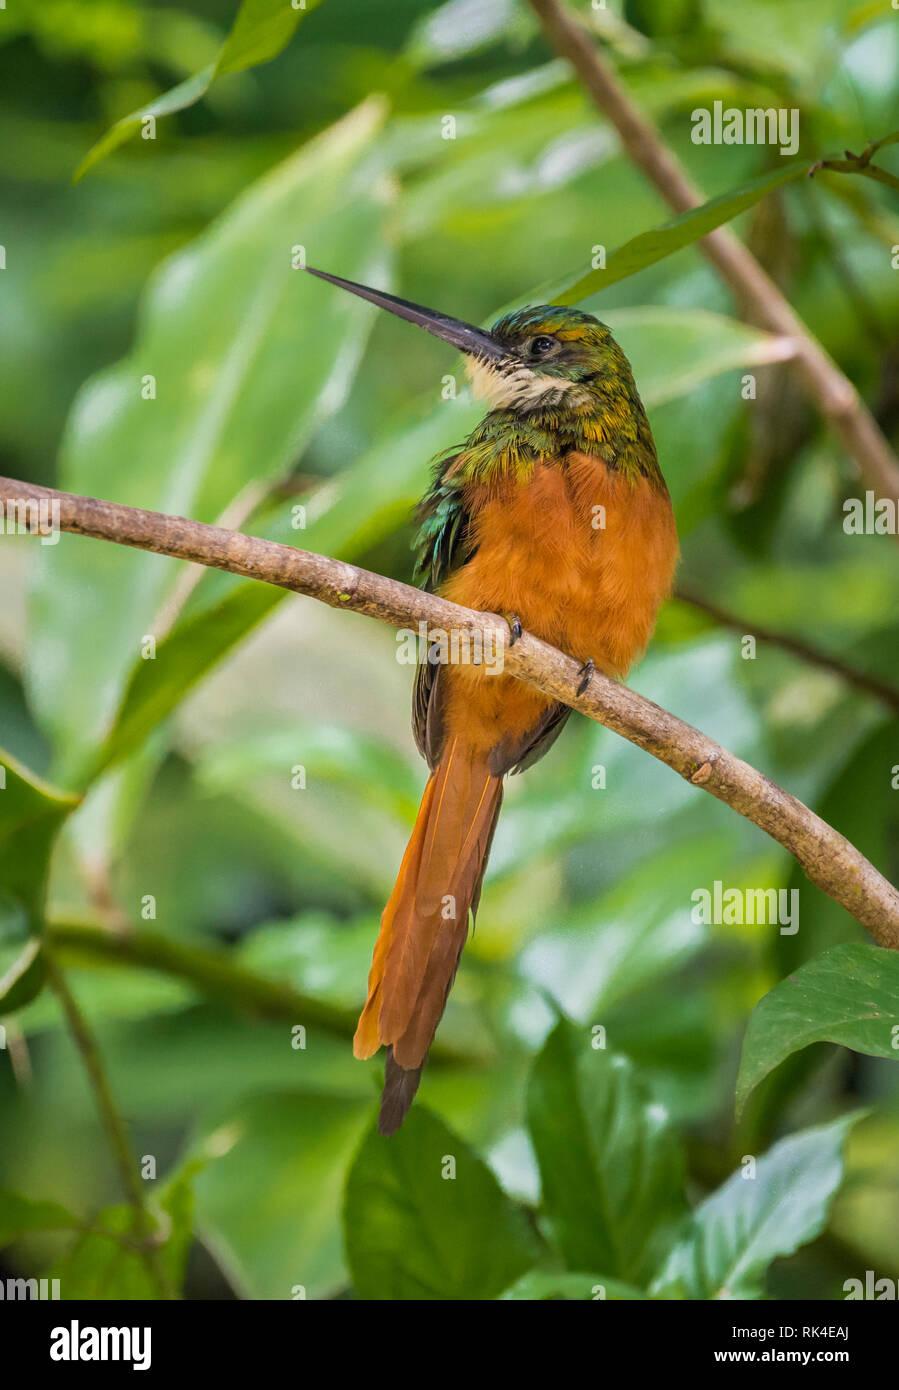 Rufous-tailed Jacamar (Galbula ruficauda), in Tobago Main Ridge Forest Reserve, a UNESCO World Heritage Site; Tobago Island, Trinidad and Tobago. - Stock Image